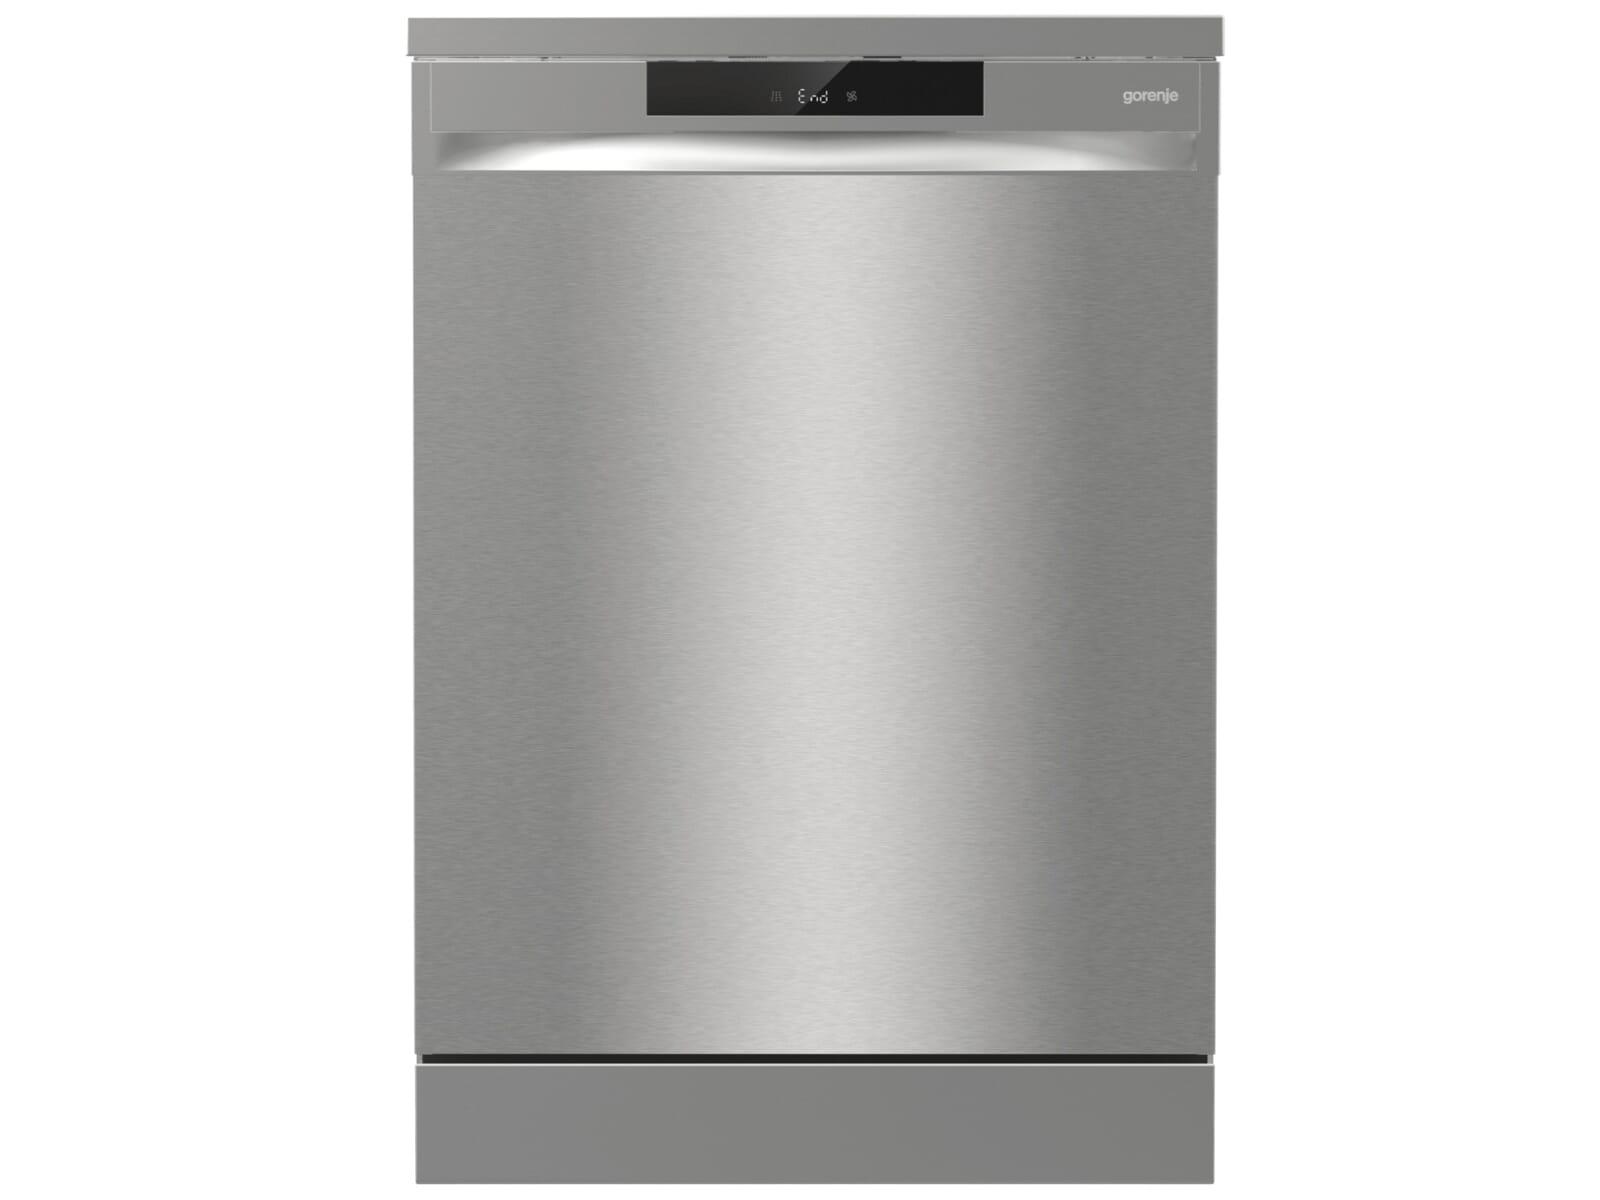 Gorenje Kühlschrank Silber : Gorenje r fx kühlschrank edelstahl a gorenje r fx kühlschrank